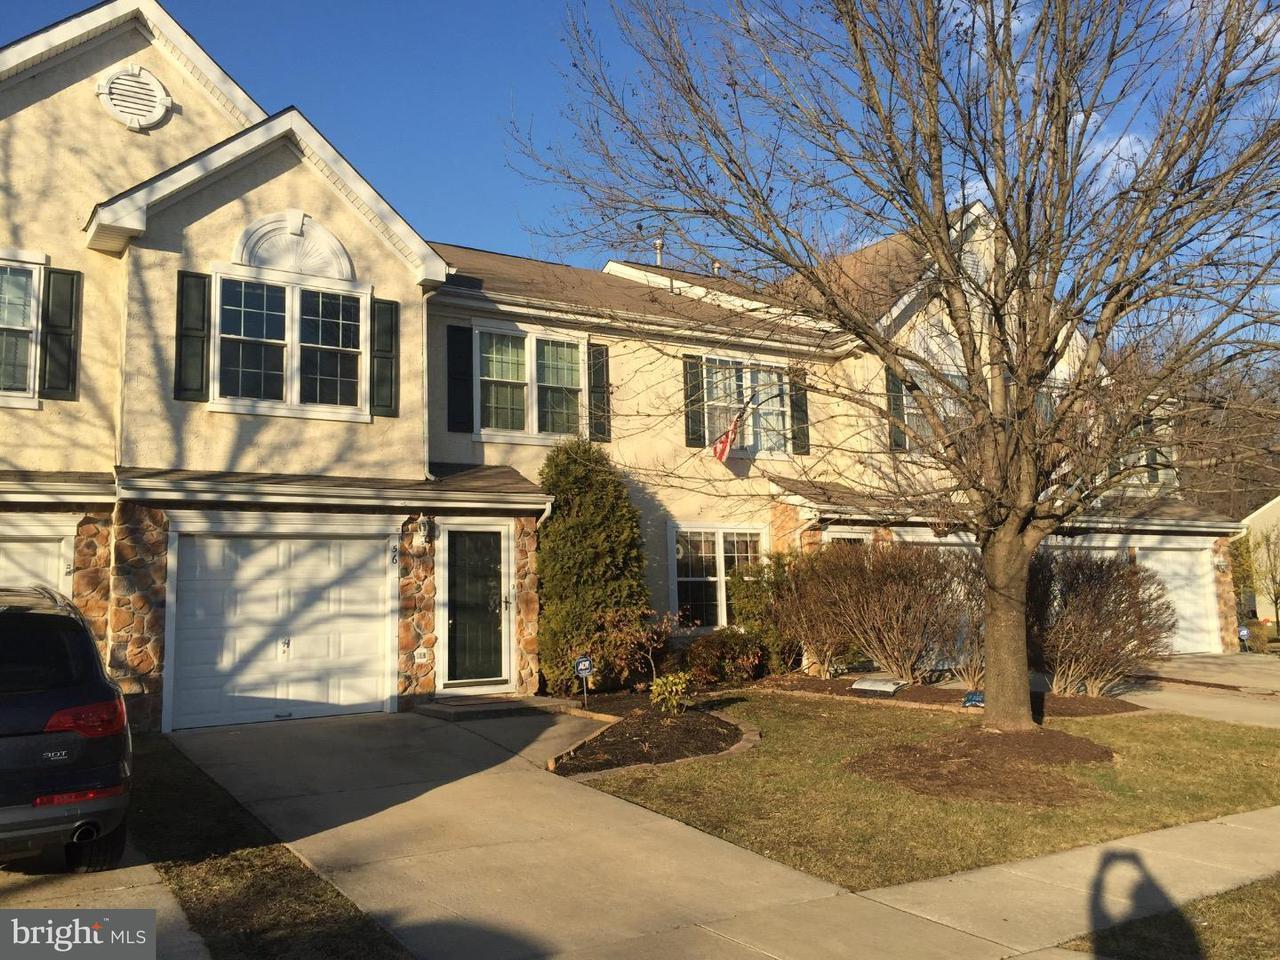 联栋屋 为 出租 在 56 STOKES Road Mount Laurel, 新泽西州 08054 美国